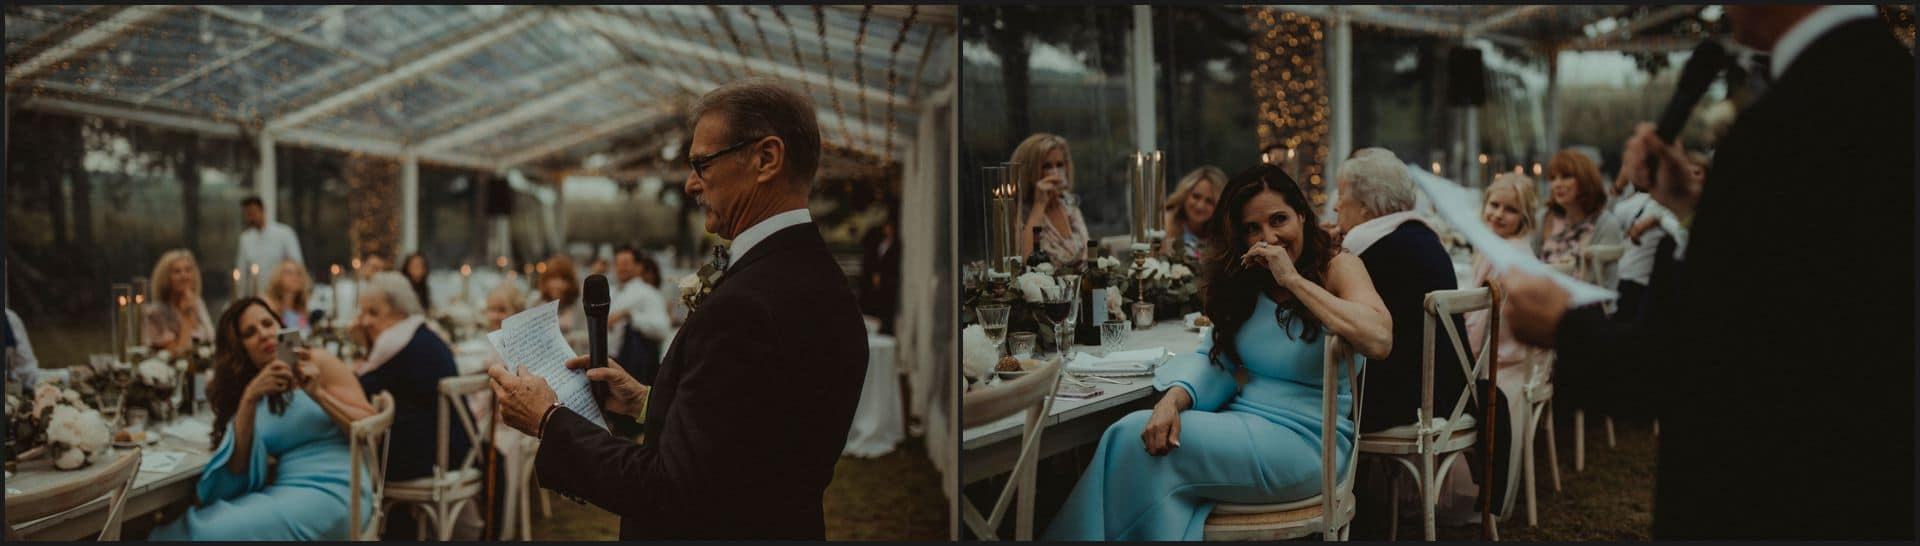 tuscany, destination wedding, chianti, wedding speech